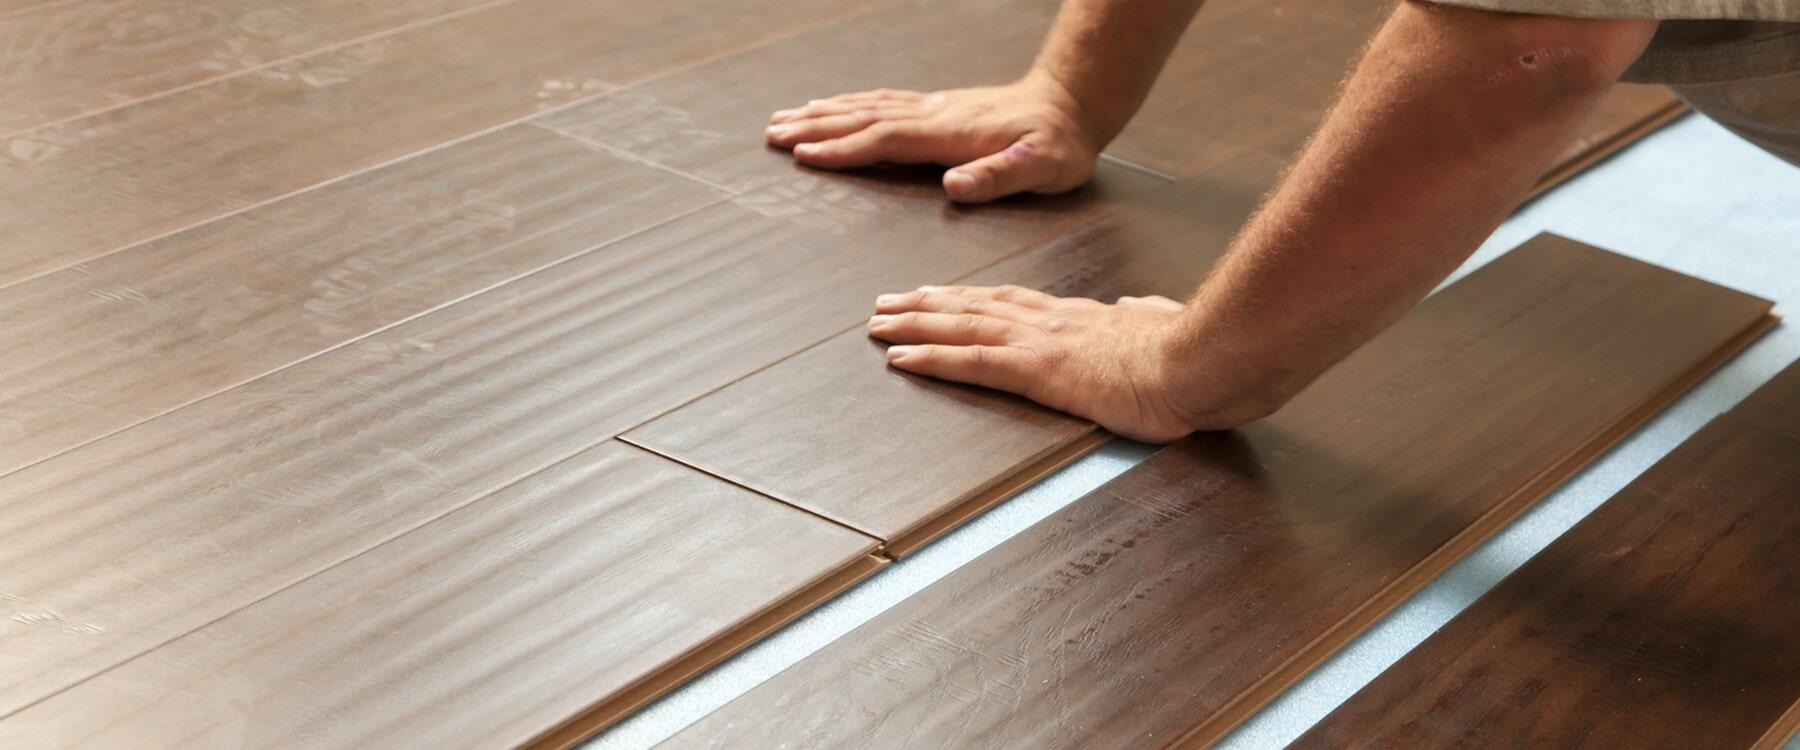 Your trusted Lancaster, CA area flooring contractors - Metro Floors